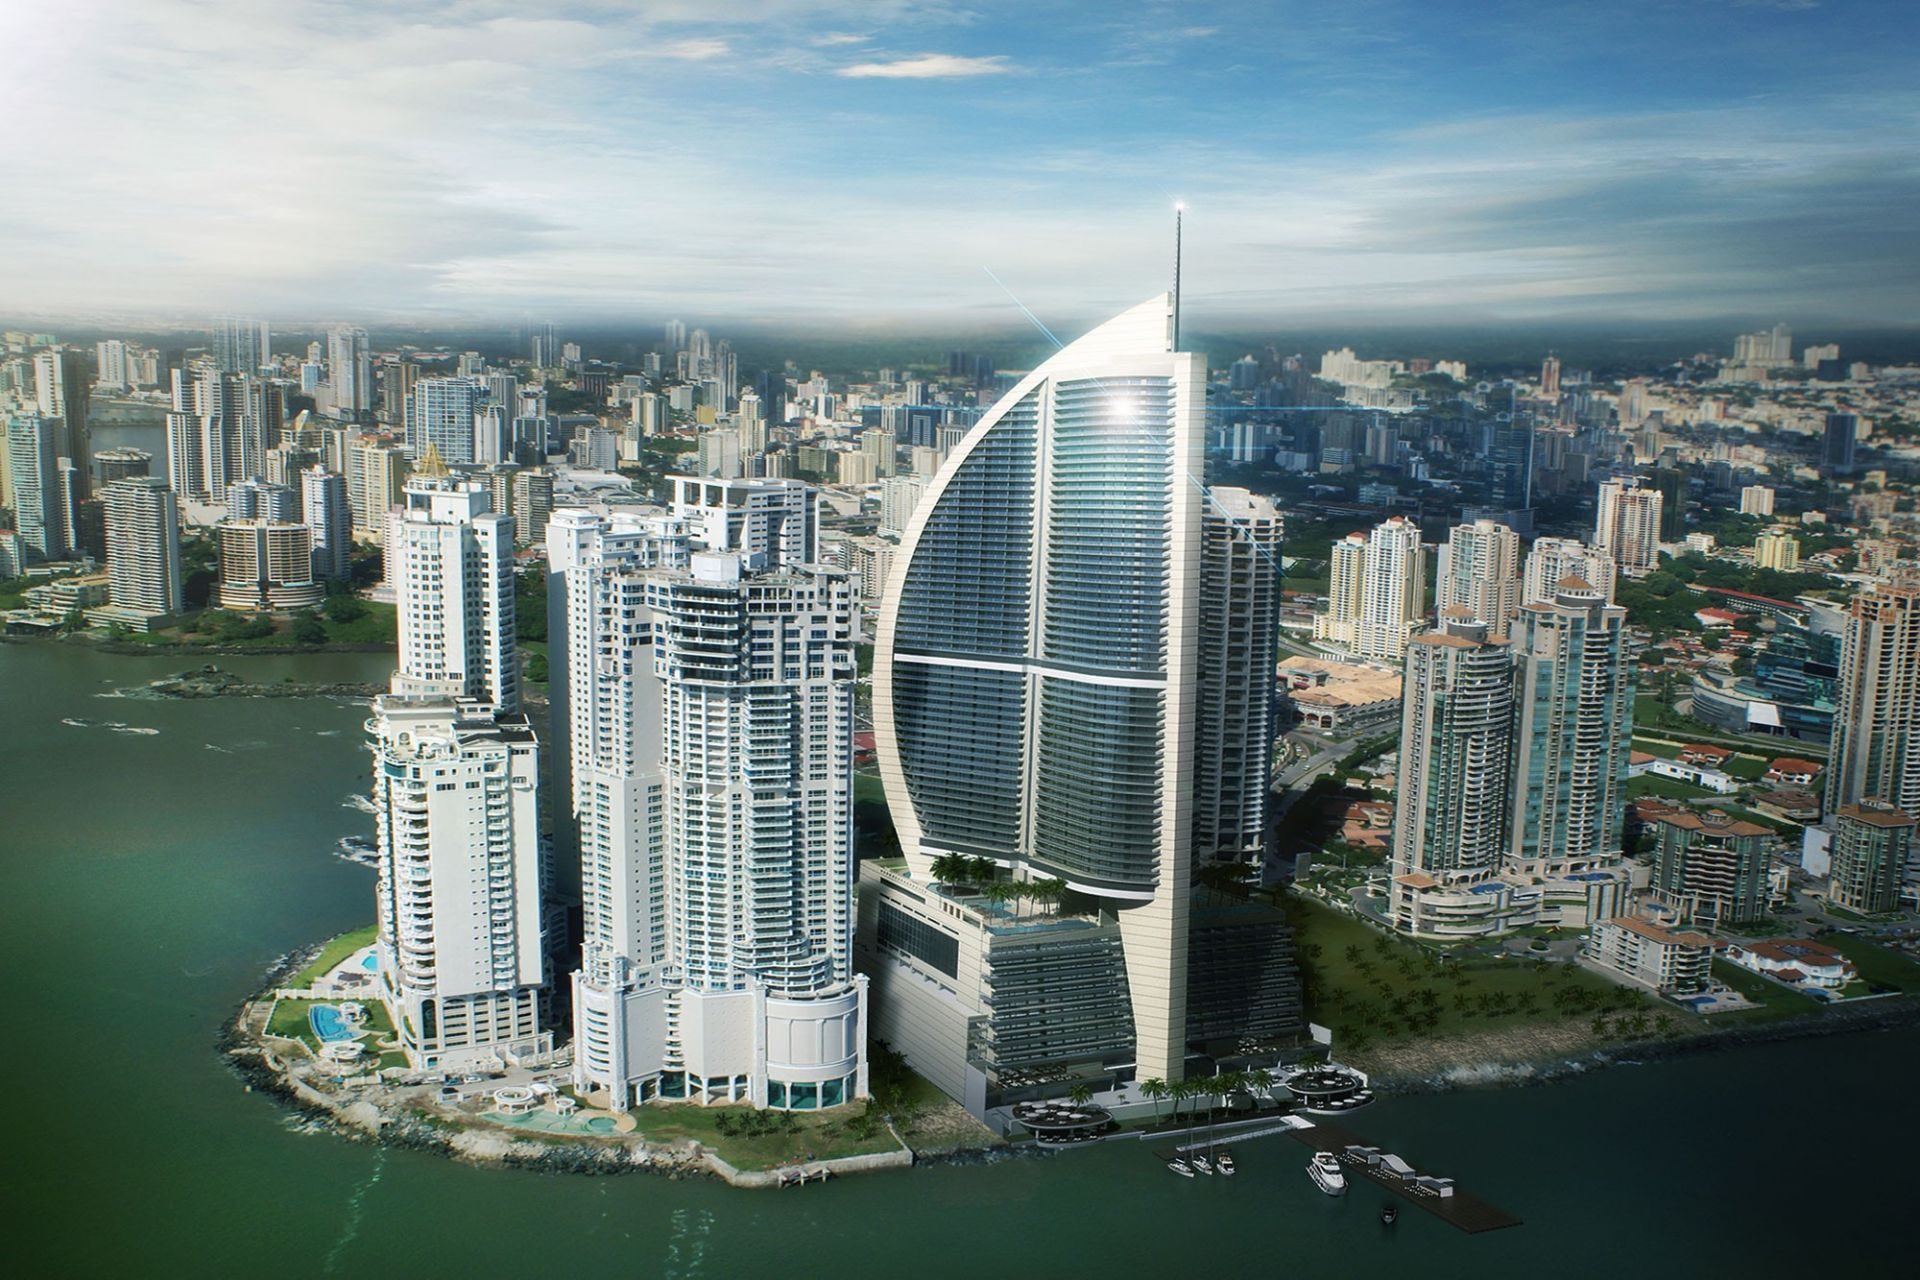 Trump Ocean Club Panamá.